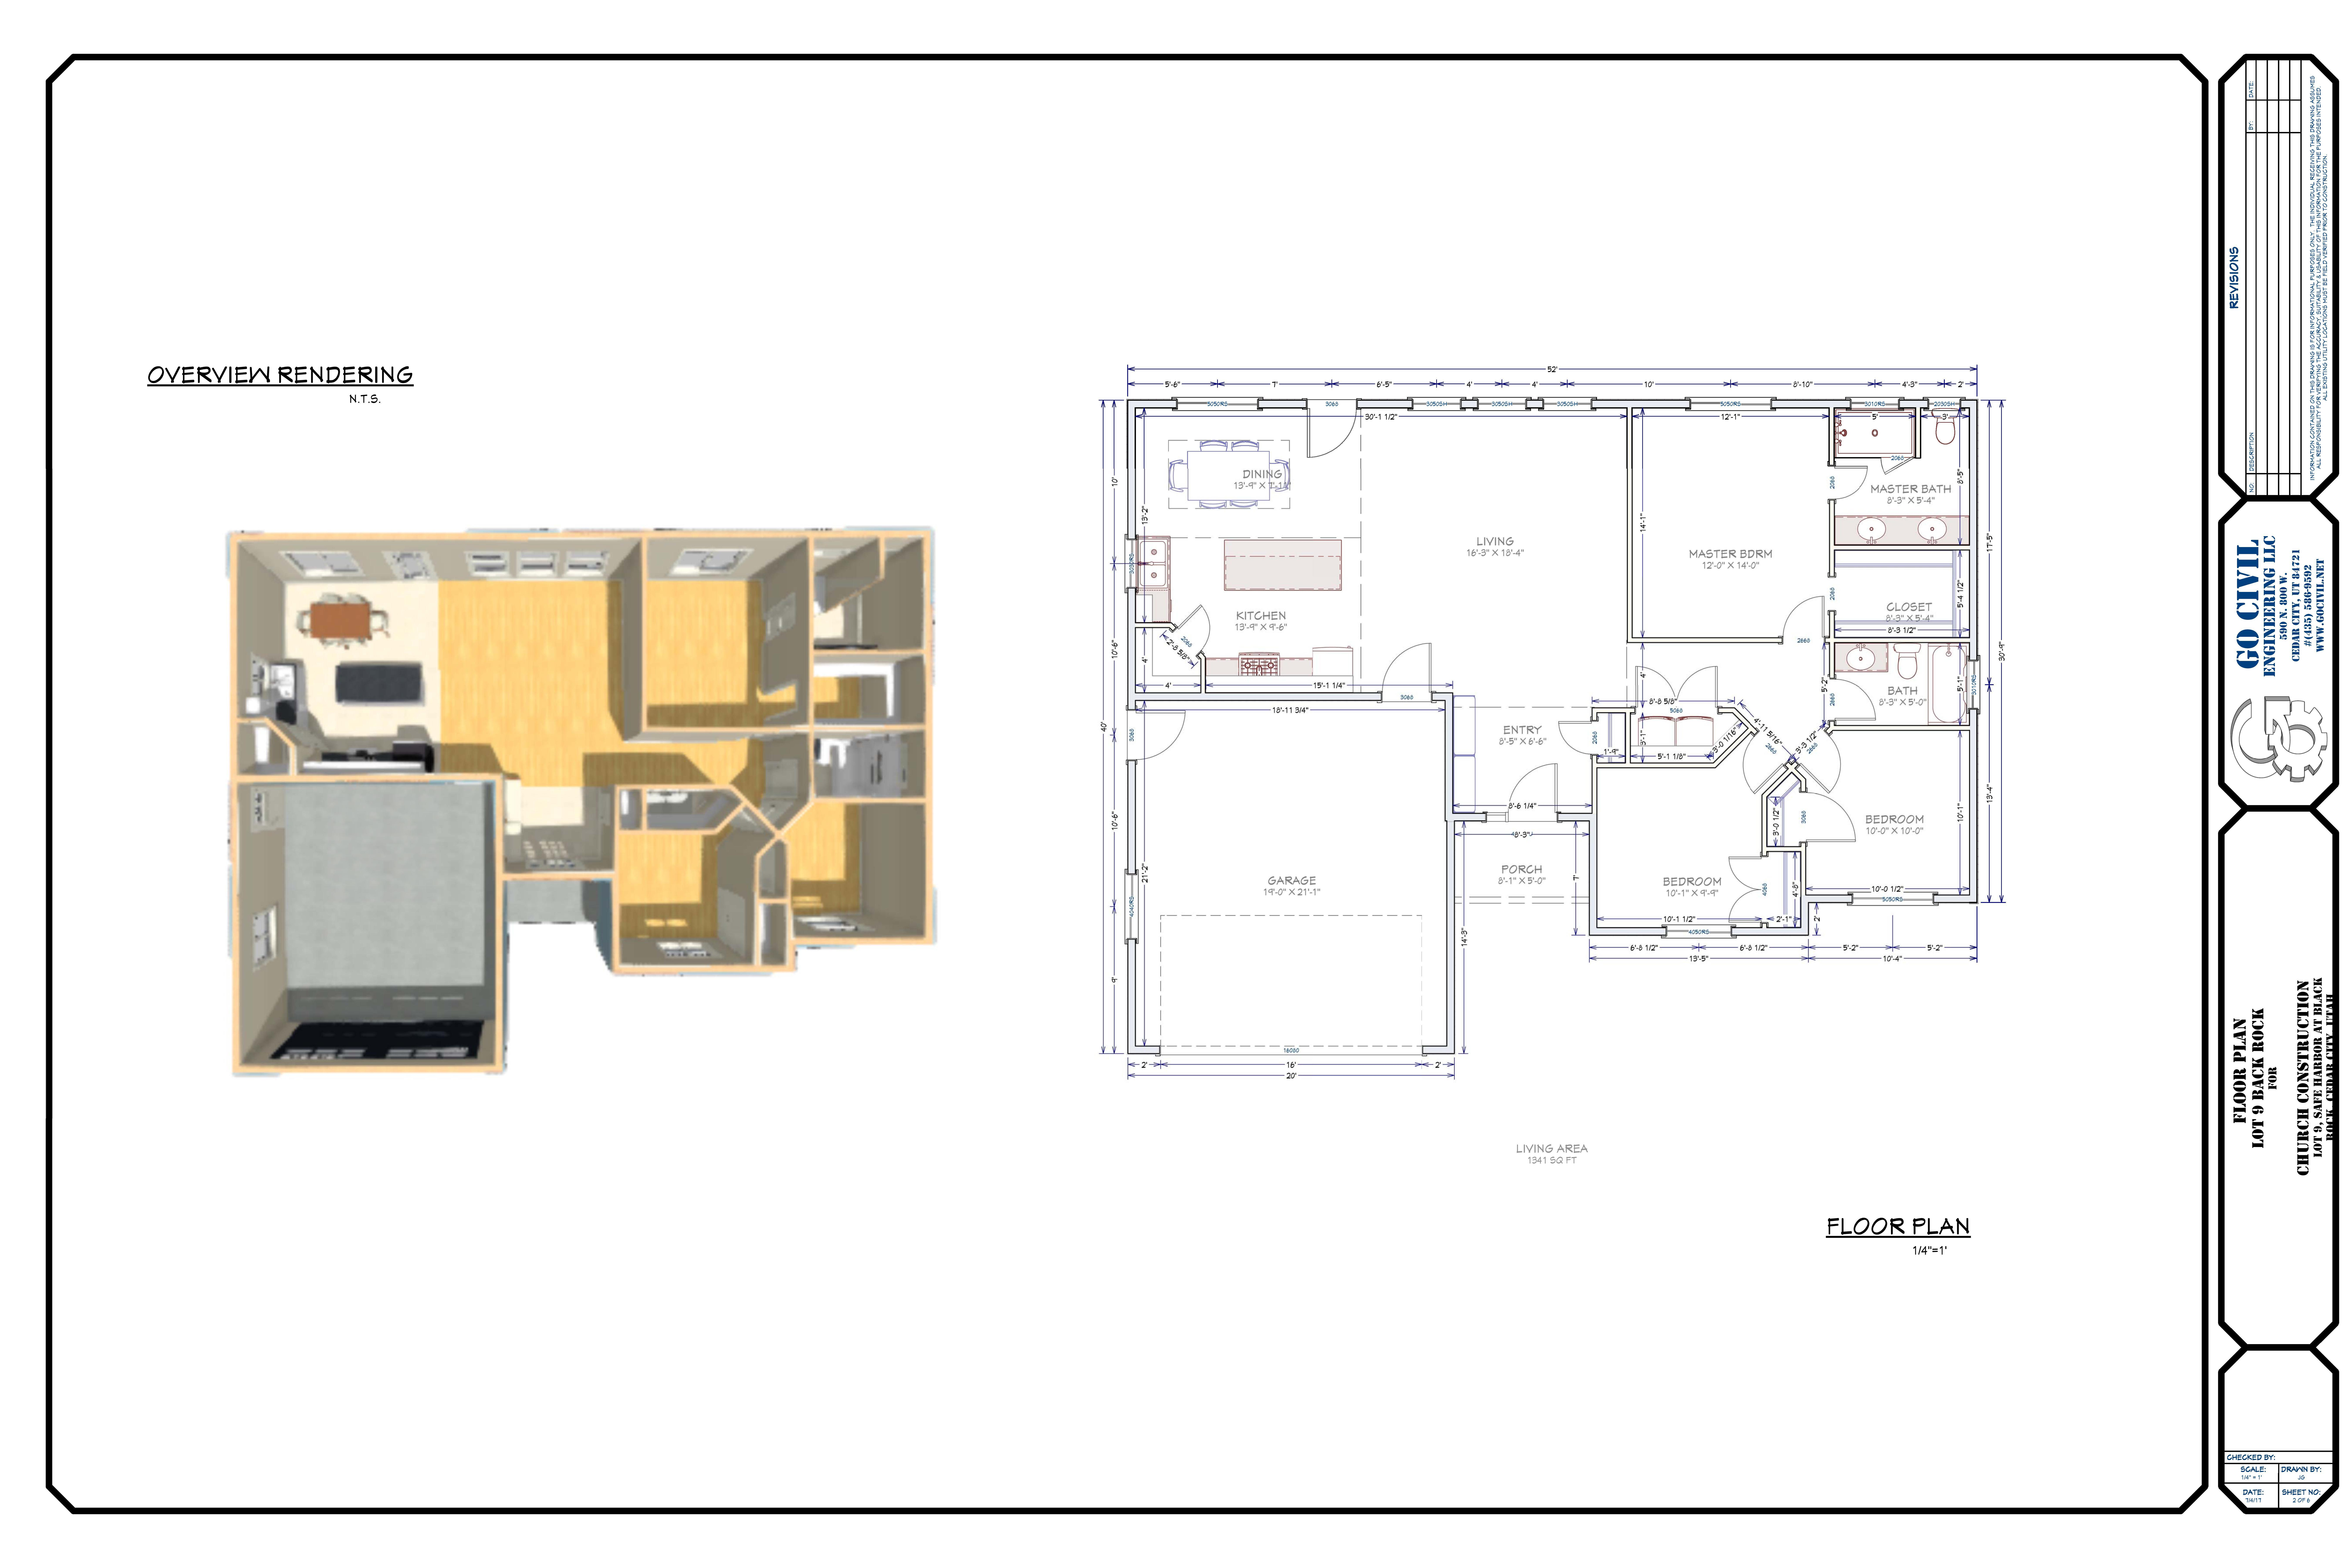 Lot 9 (10-23-17) (1)-page-003.jpg